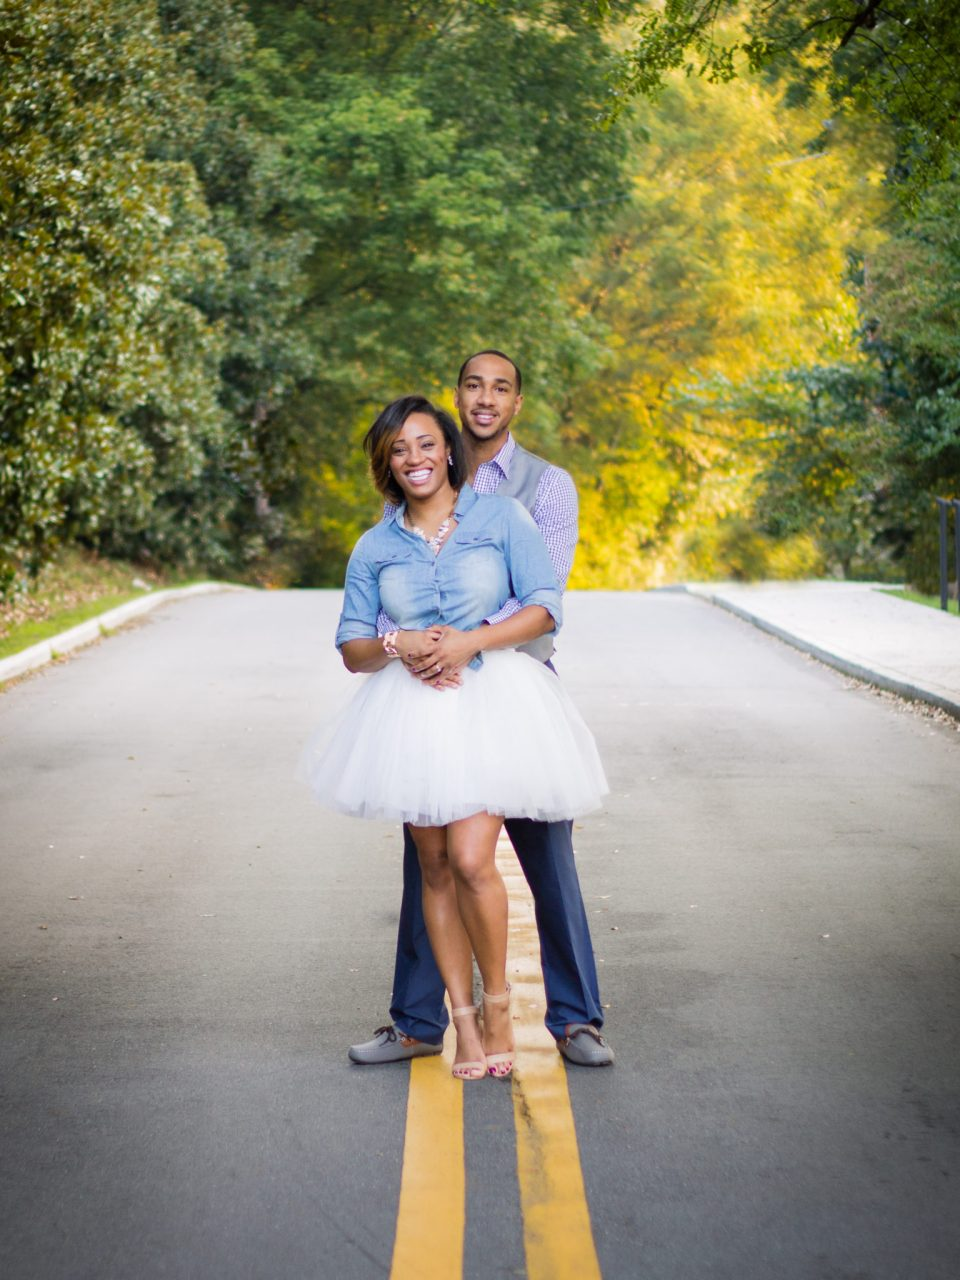 AD7-960x1280 Amber and Andrew, Atlanta Love